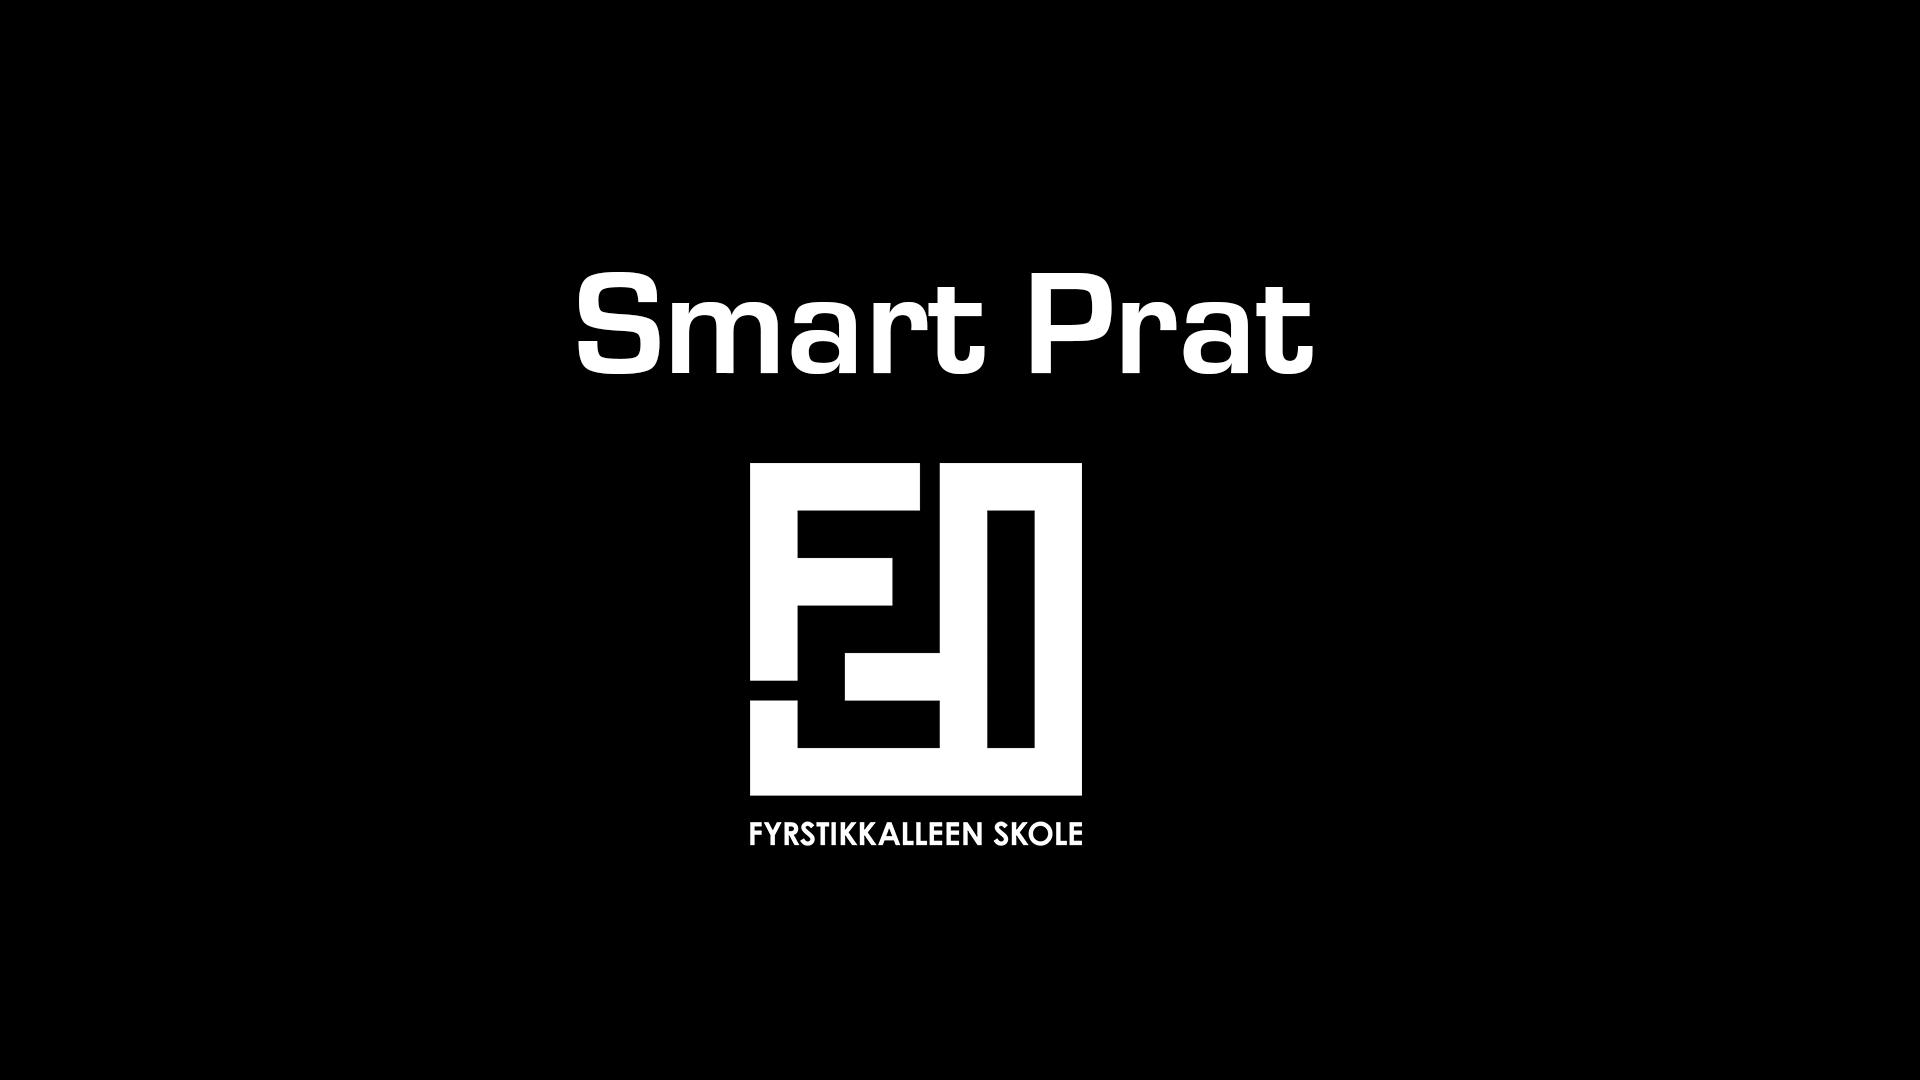 SmartPrat